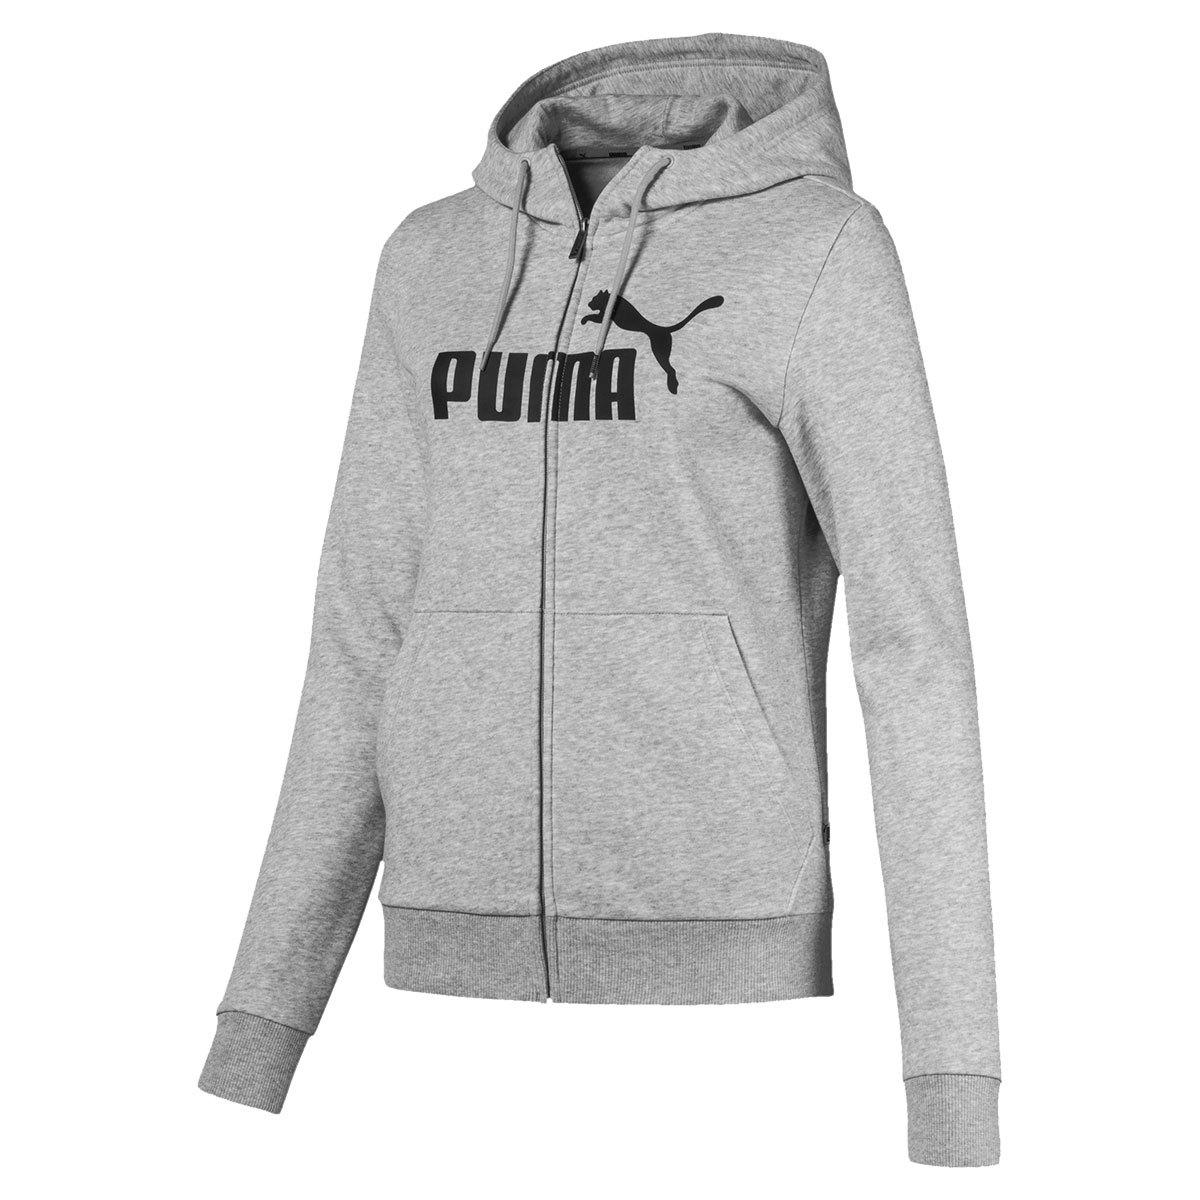 Puma Women's Essentials Fleece Pullover Hoodie - Black, S